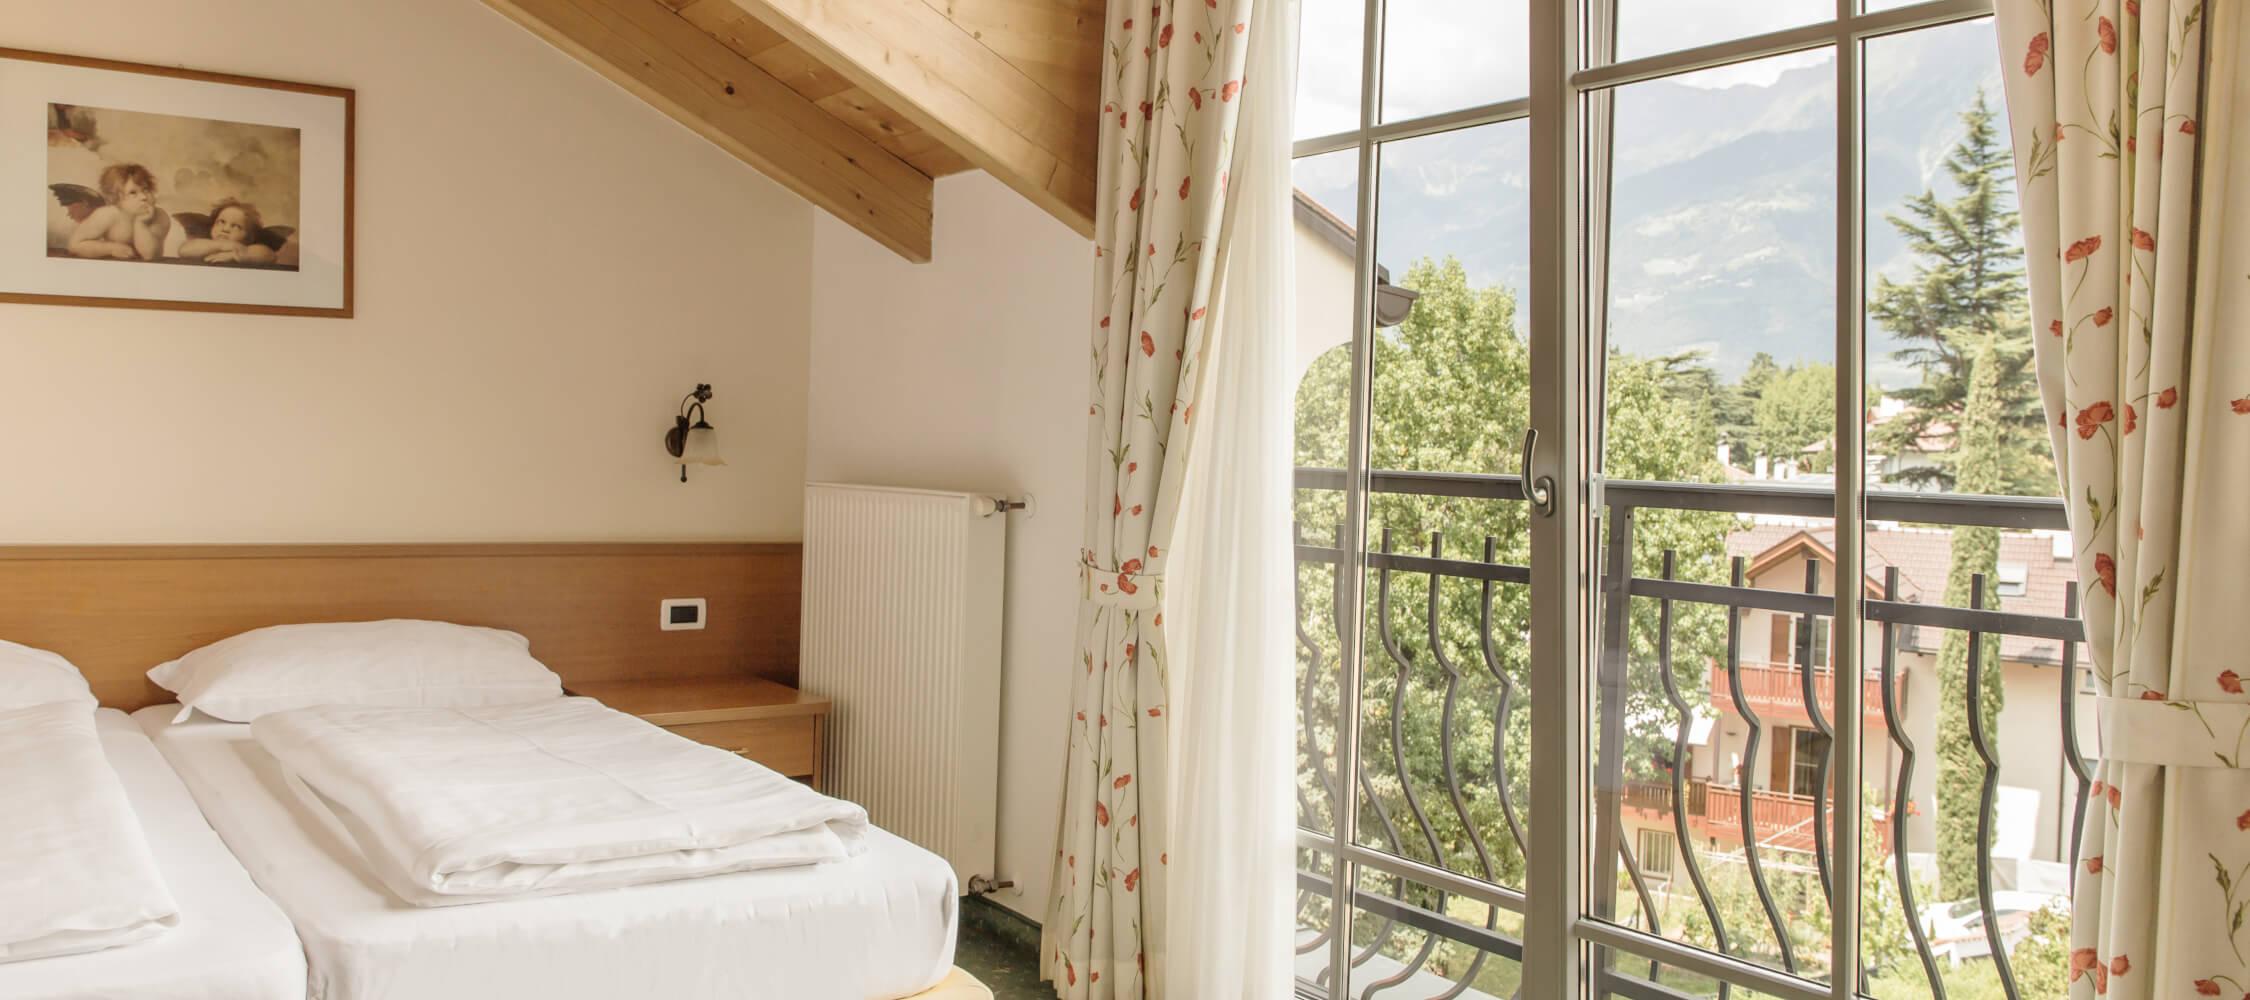 Hotel-Villa-Laurus-Merano-Rooms-Doppelzimmer-Vista-Anguane-6944-2250x1000